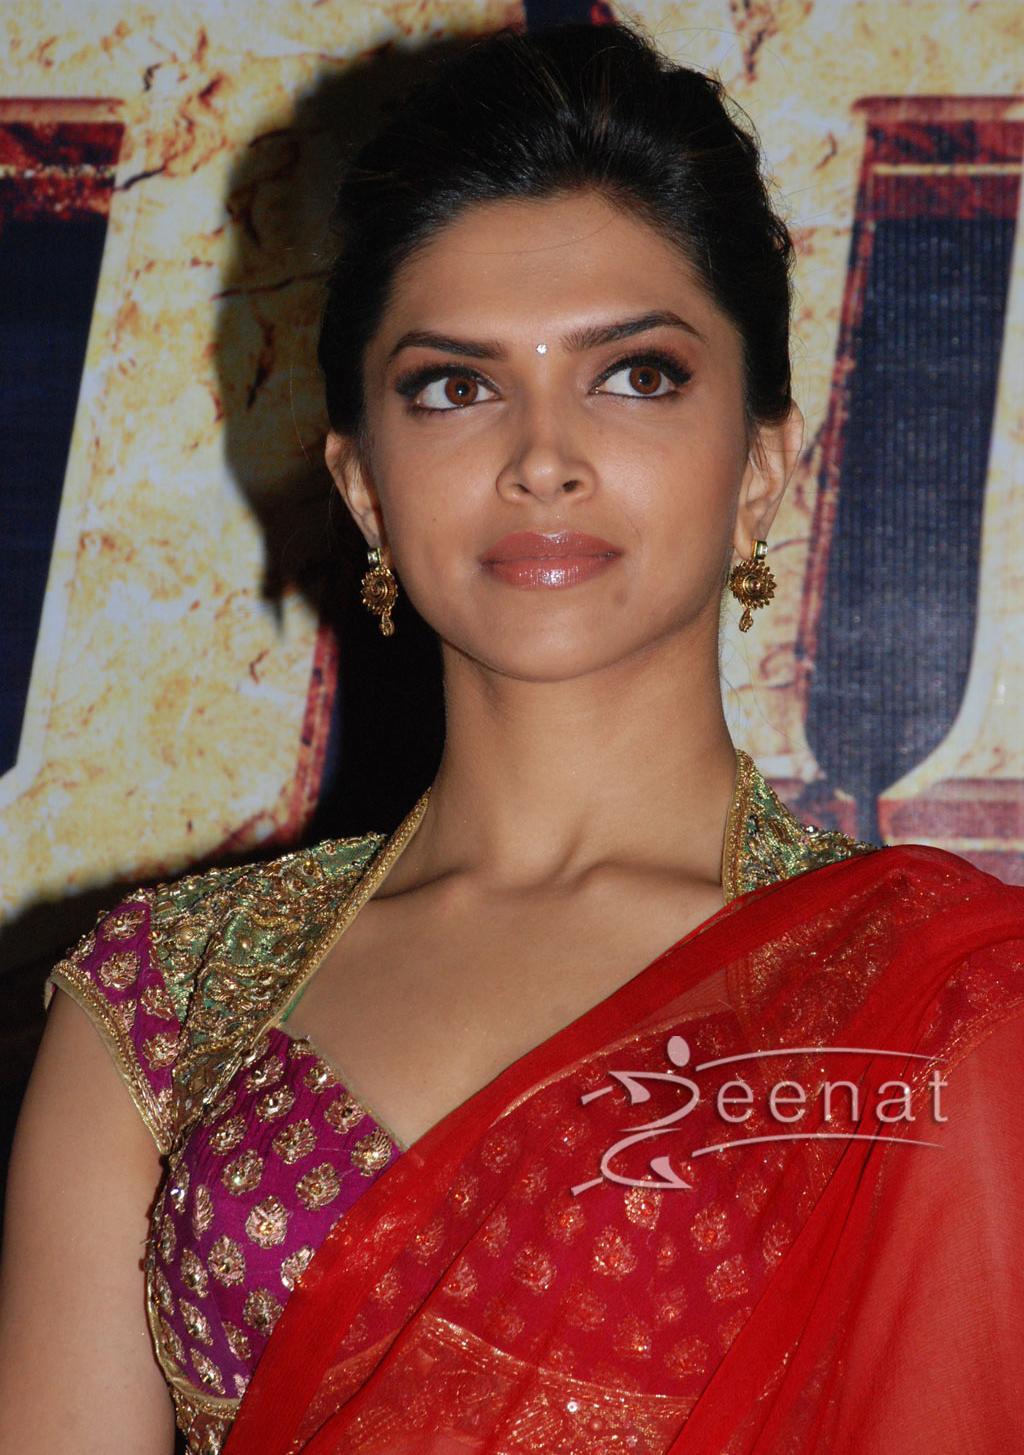 Deepika Padukone Red Saree Designs